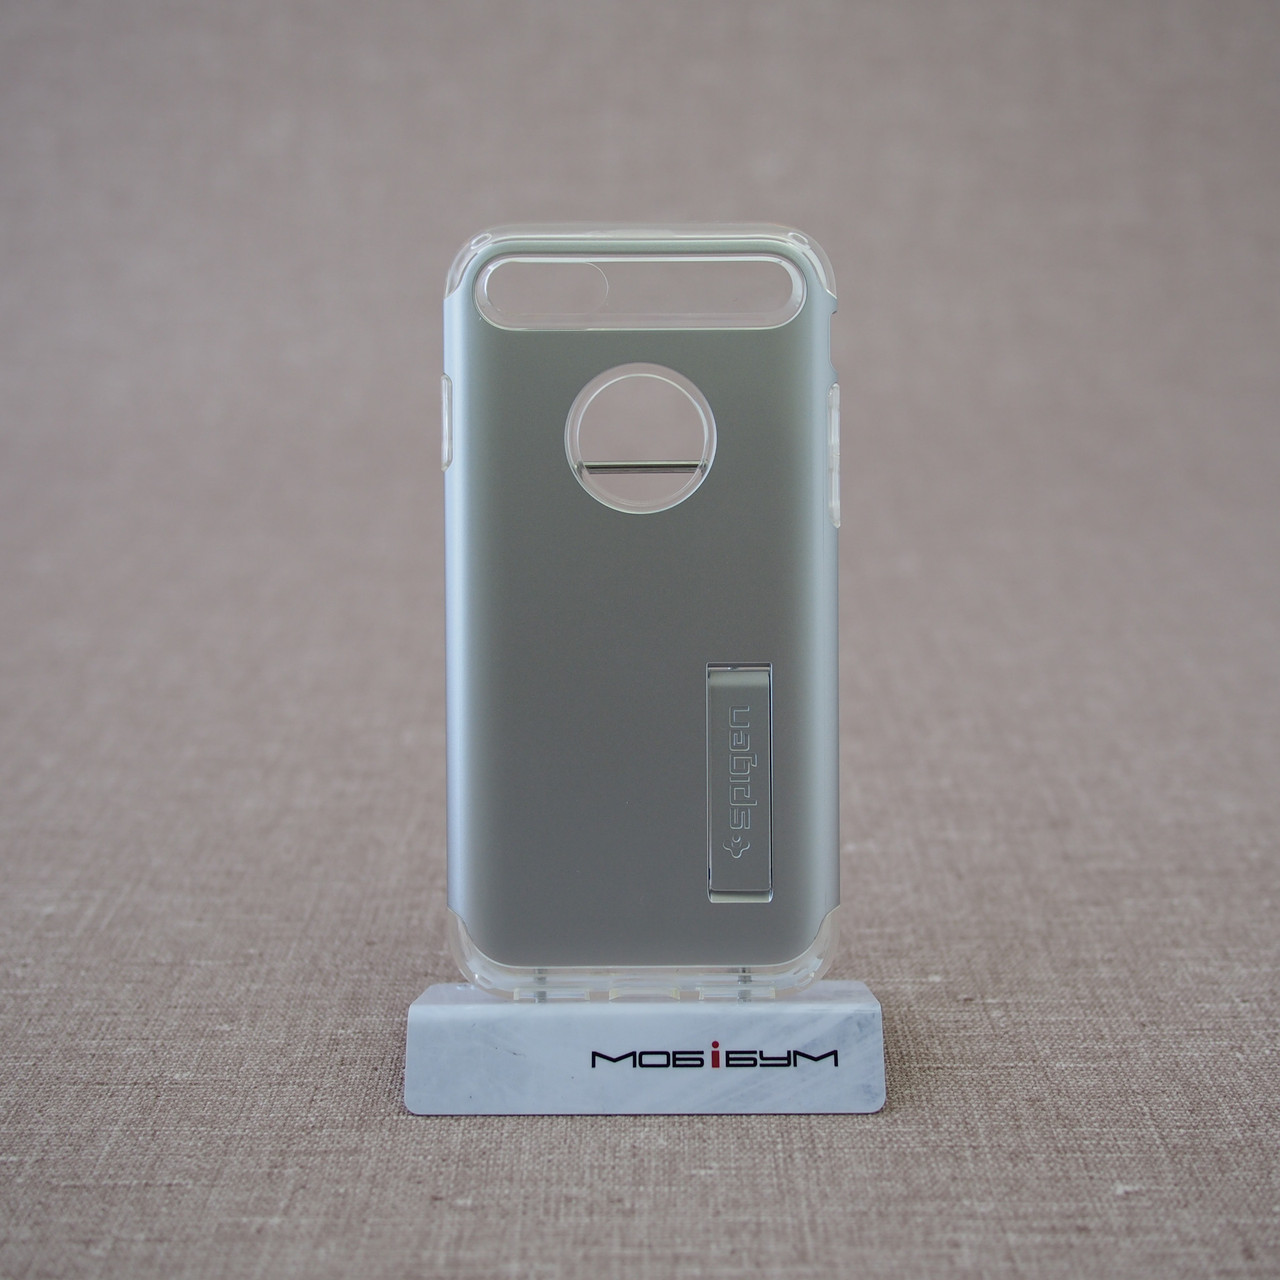 Чехол Spigen Slim Armor iPhone 7 satin silver (042CS20305) EAN/UPC: 8809466644542